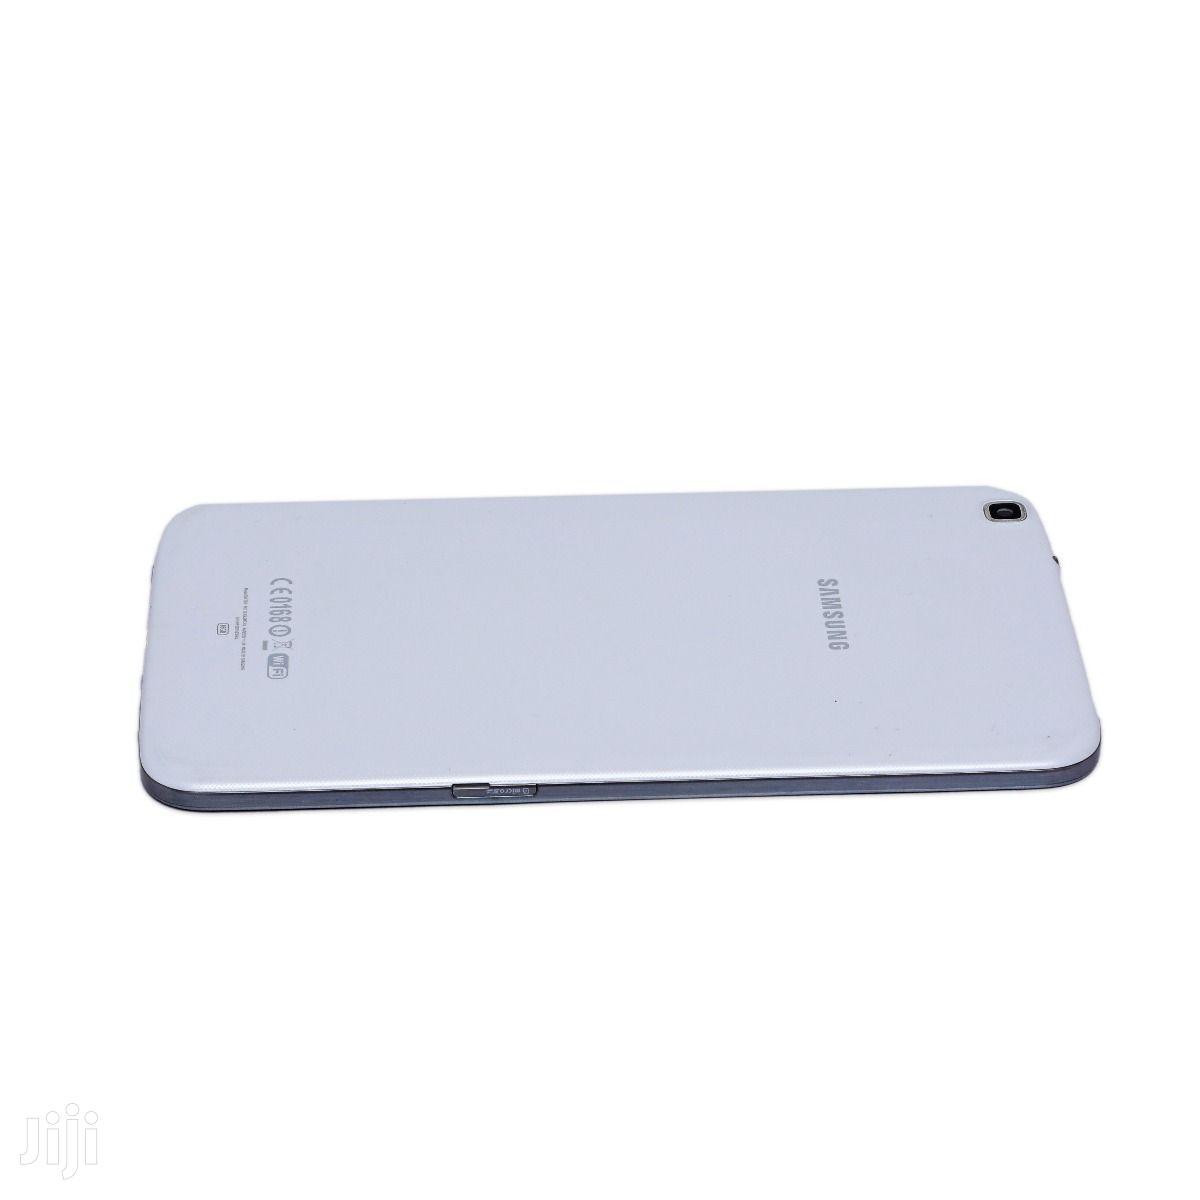 Samsung Galaxy Tab 3 7.0 16 GB White | Tablets for sale in Bole, Addis Ababa, Ethiopia